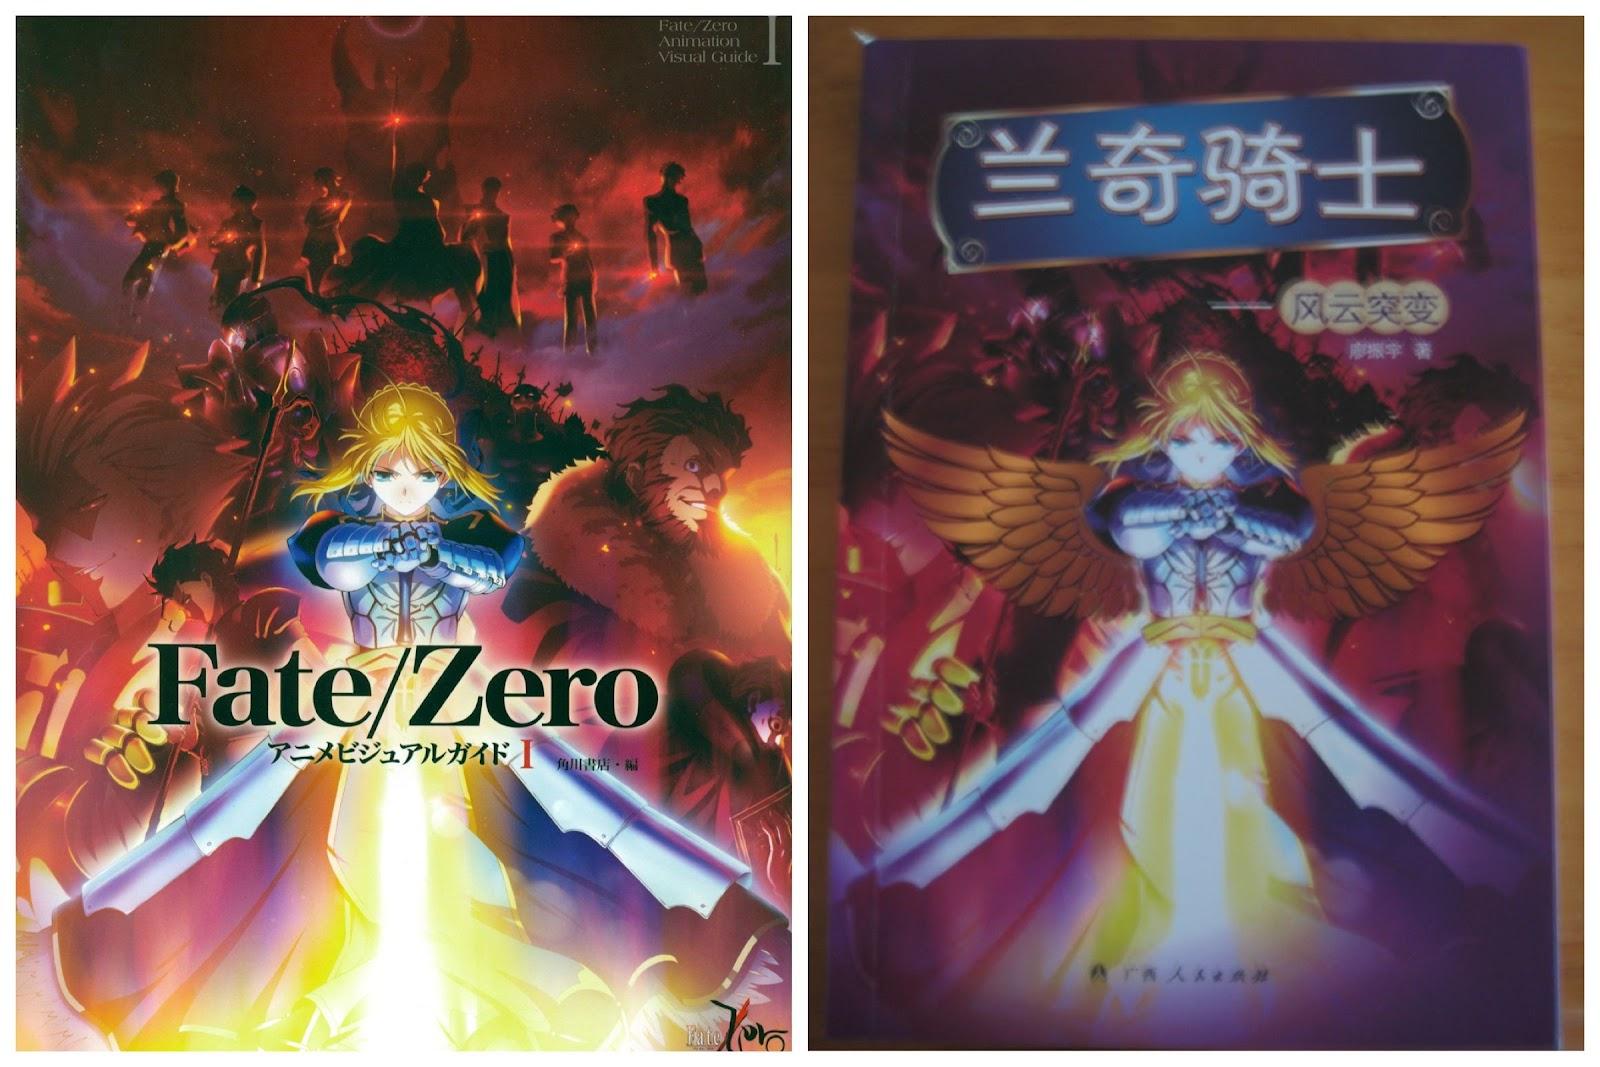 http://1.bp.blogspot.com/-9GVQOAJnYi0/T_Vlt3anvTI/AAAAAAAACNg/hPm2O0e6ARQ/s1600/fate-zero-china-plagiarism.jpg